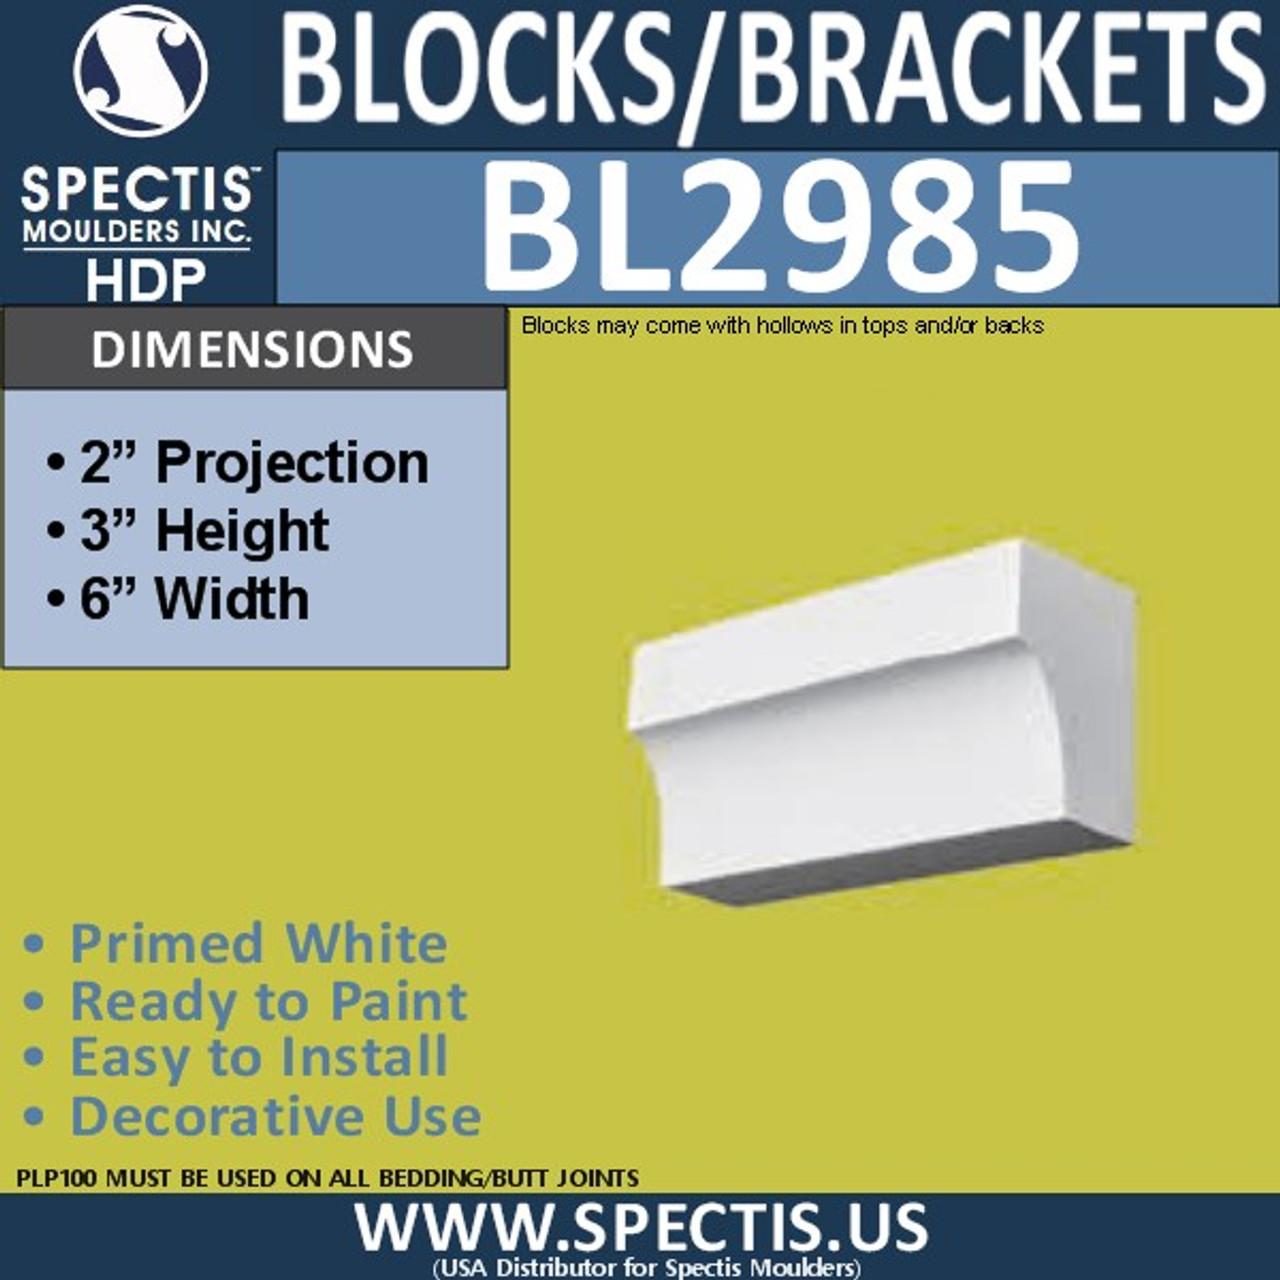 "BL2985 Eave Block or Bracket 6""W x 3""H x 2"" P"